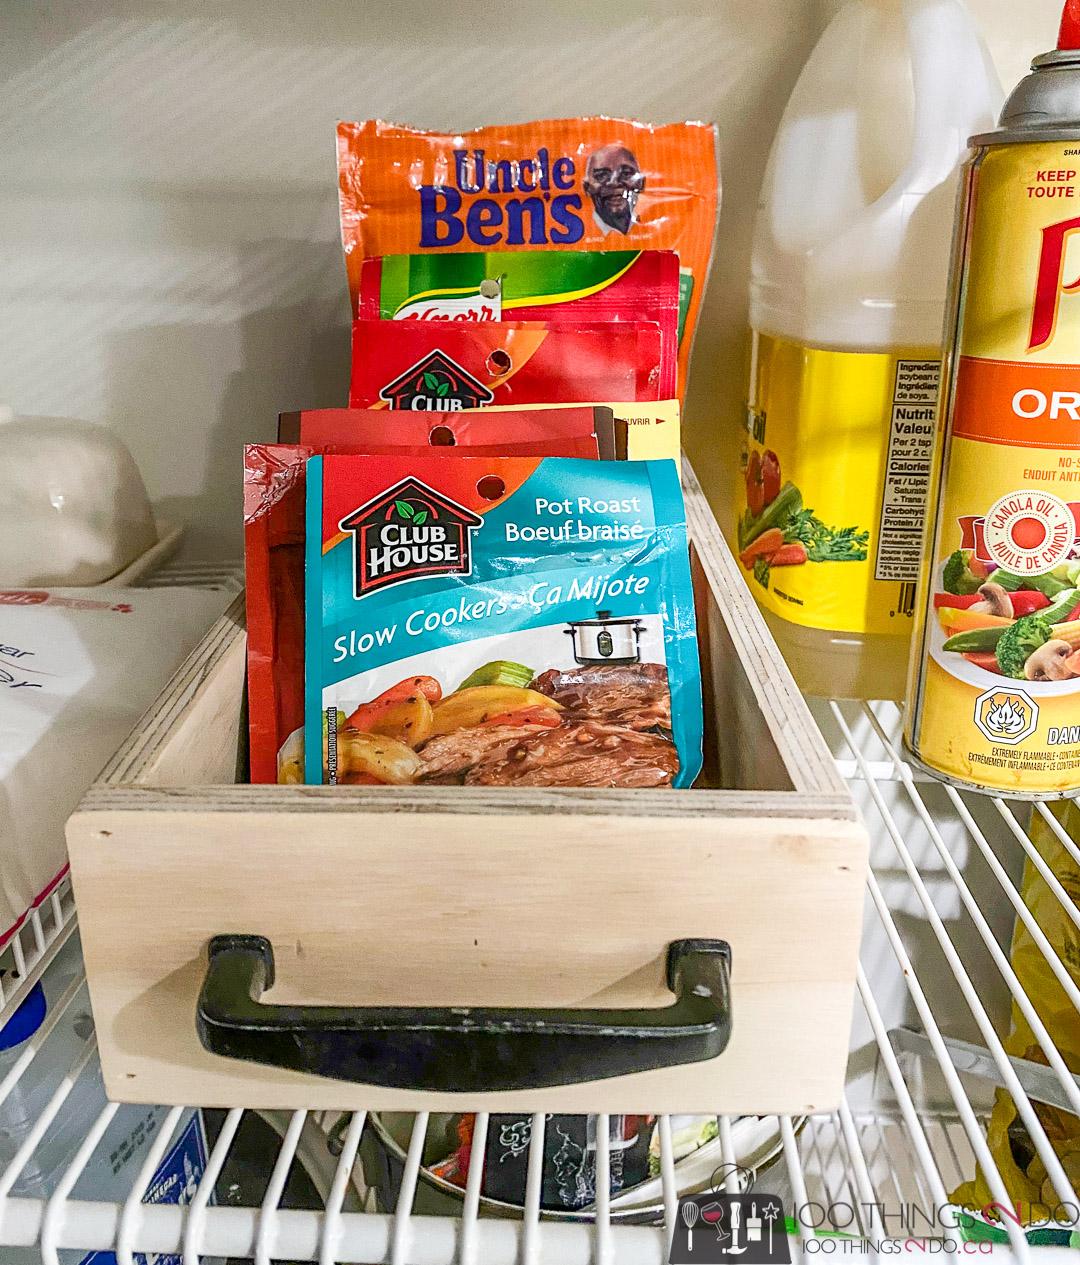 pantry organizer, spice packet organizer, small tray